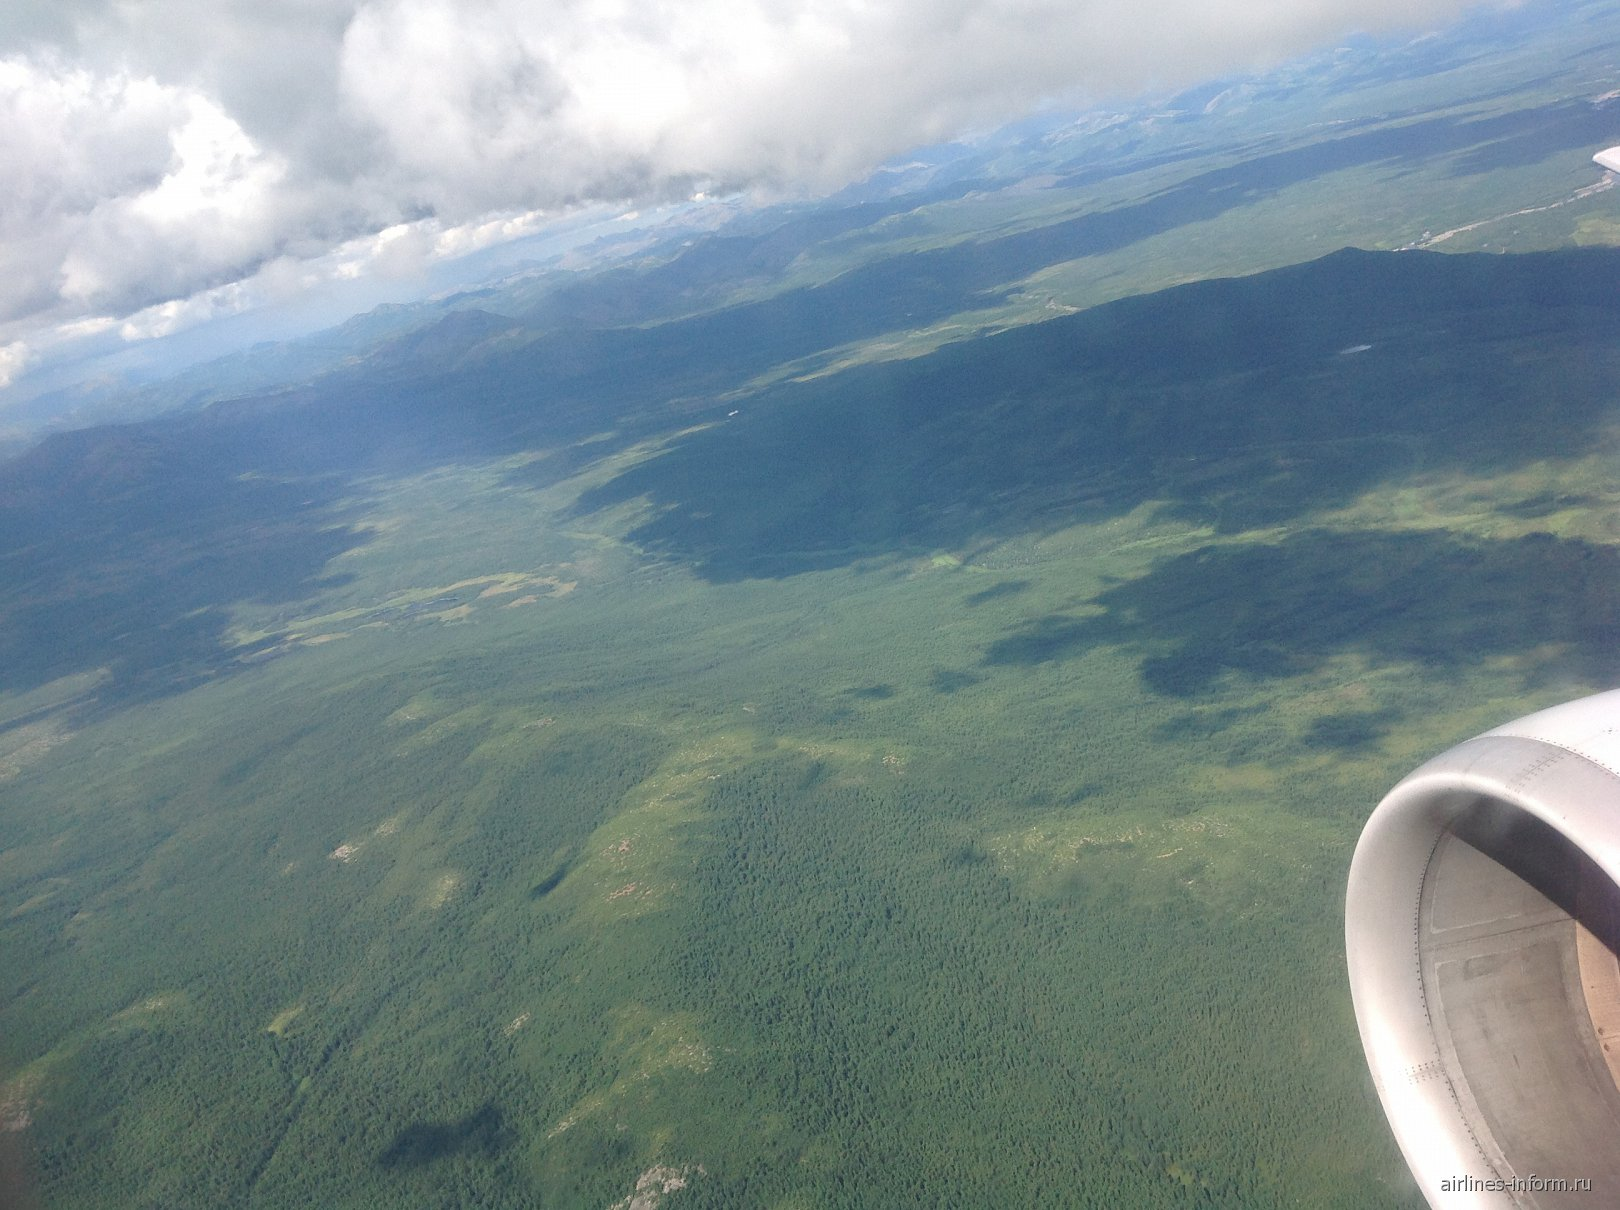 Вид из иллюминатора при взлете из Магадана